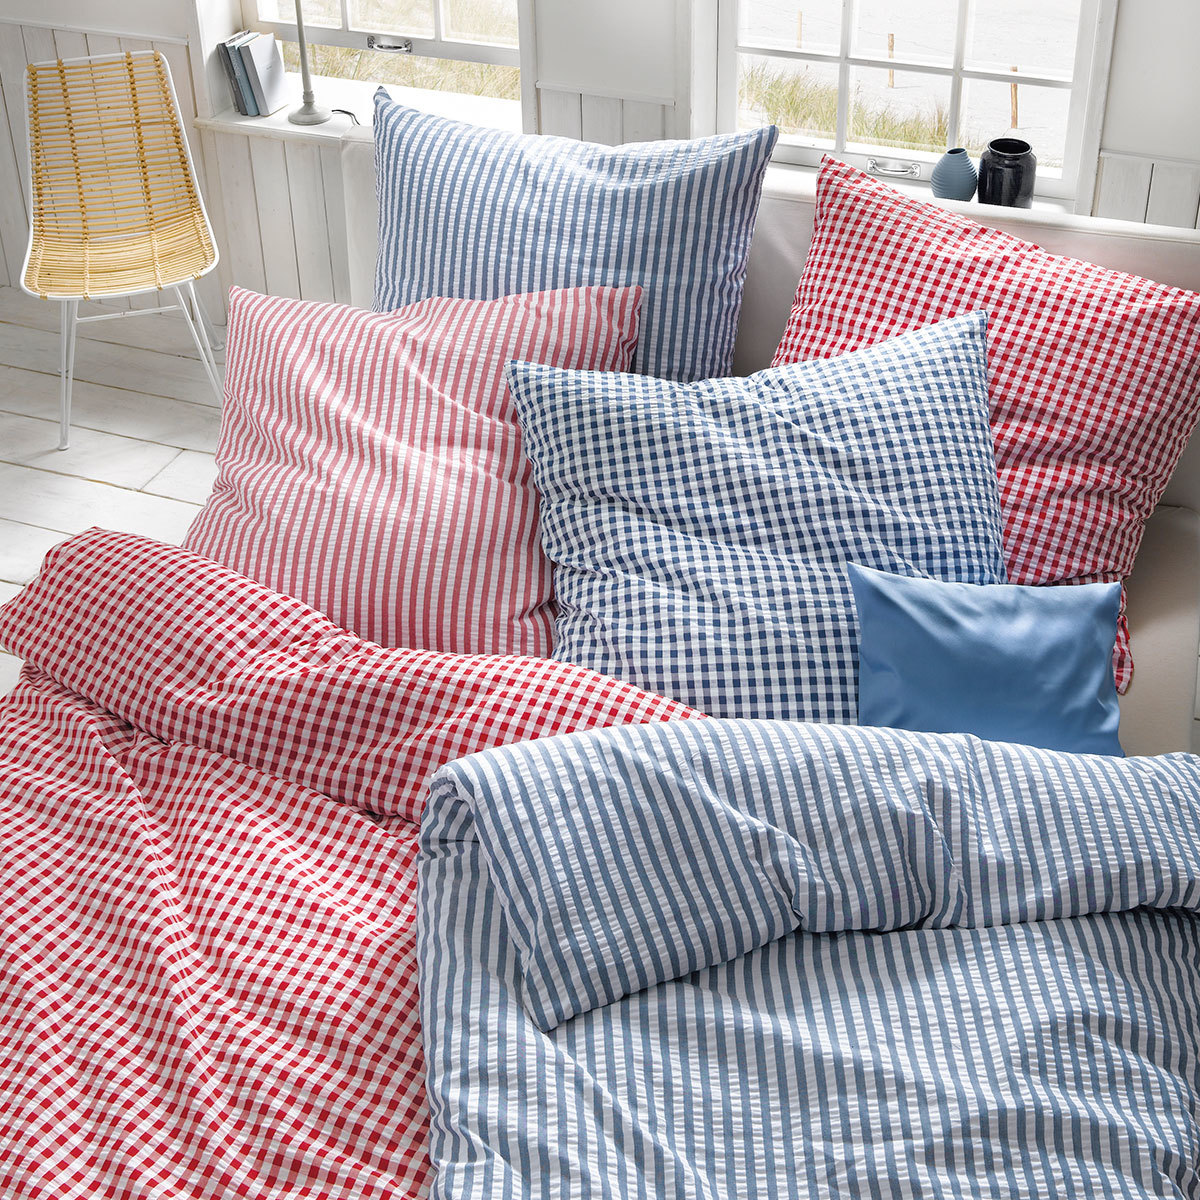 fleuresse seersucker bettw sche rio vichy rot g nstig online kaufen bei bettwaren shop. Black Bedroom Furniture Sets. Home Design Ideas